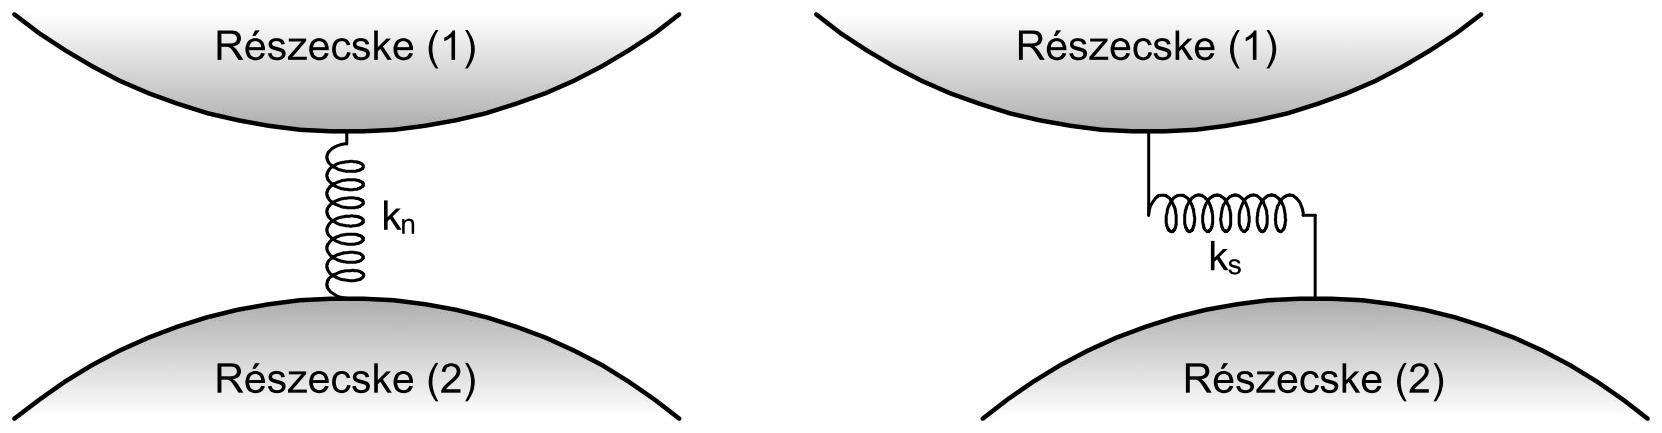 6_particle-model1